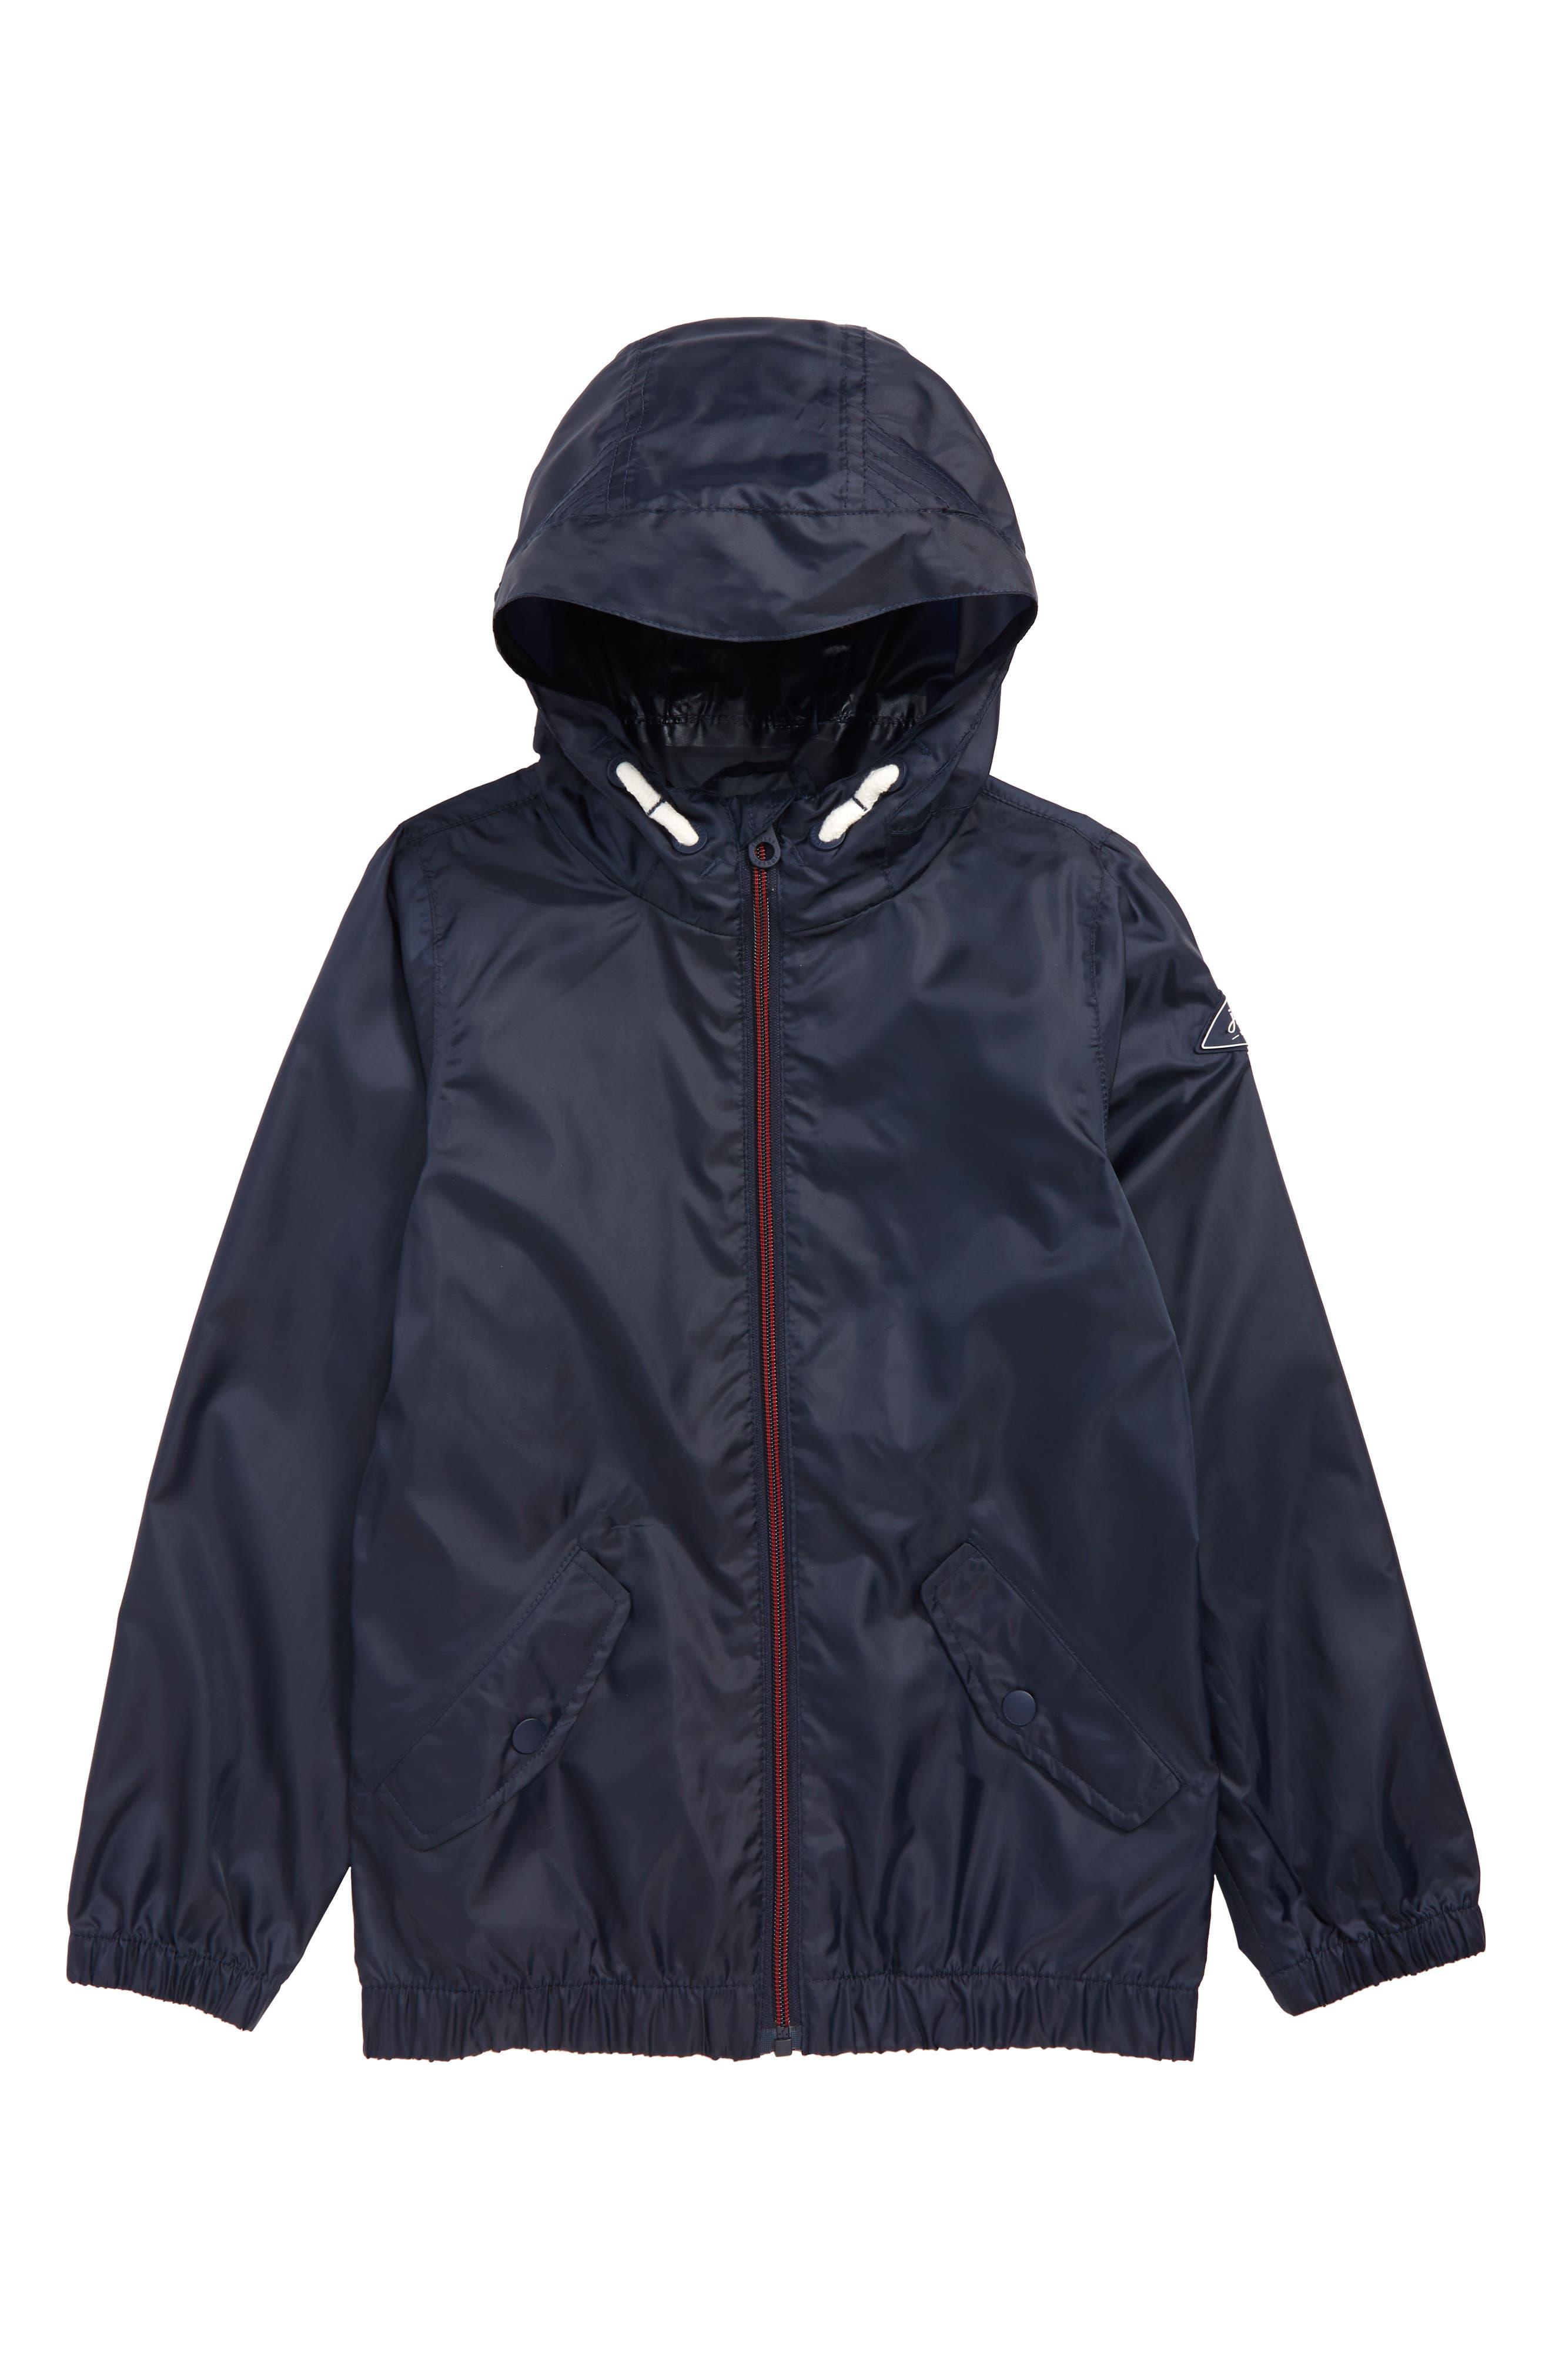 JOULES, Rowan Lightweight Packable Jacket, Main thumbnail 1, color, NAVY